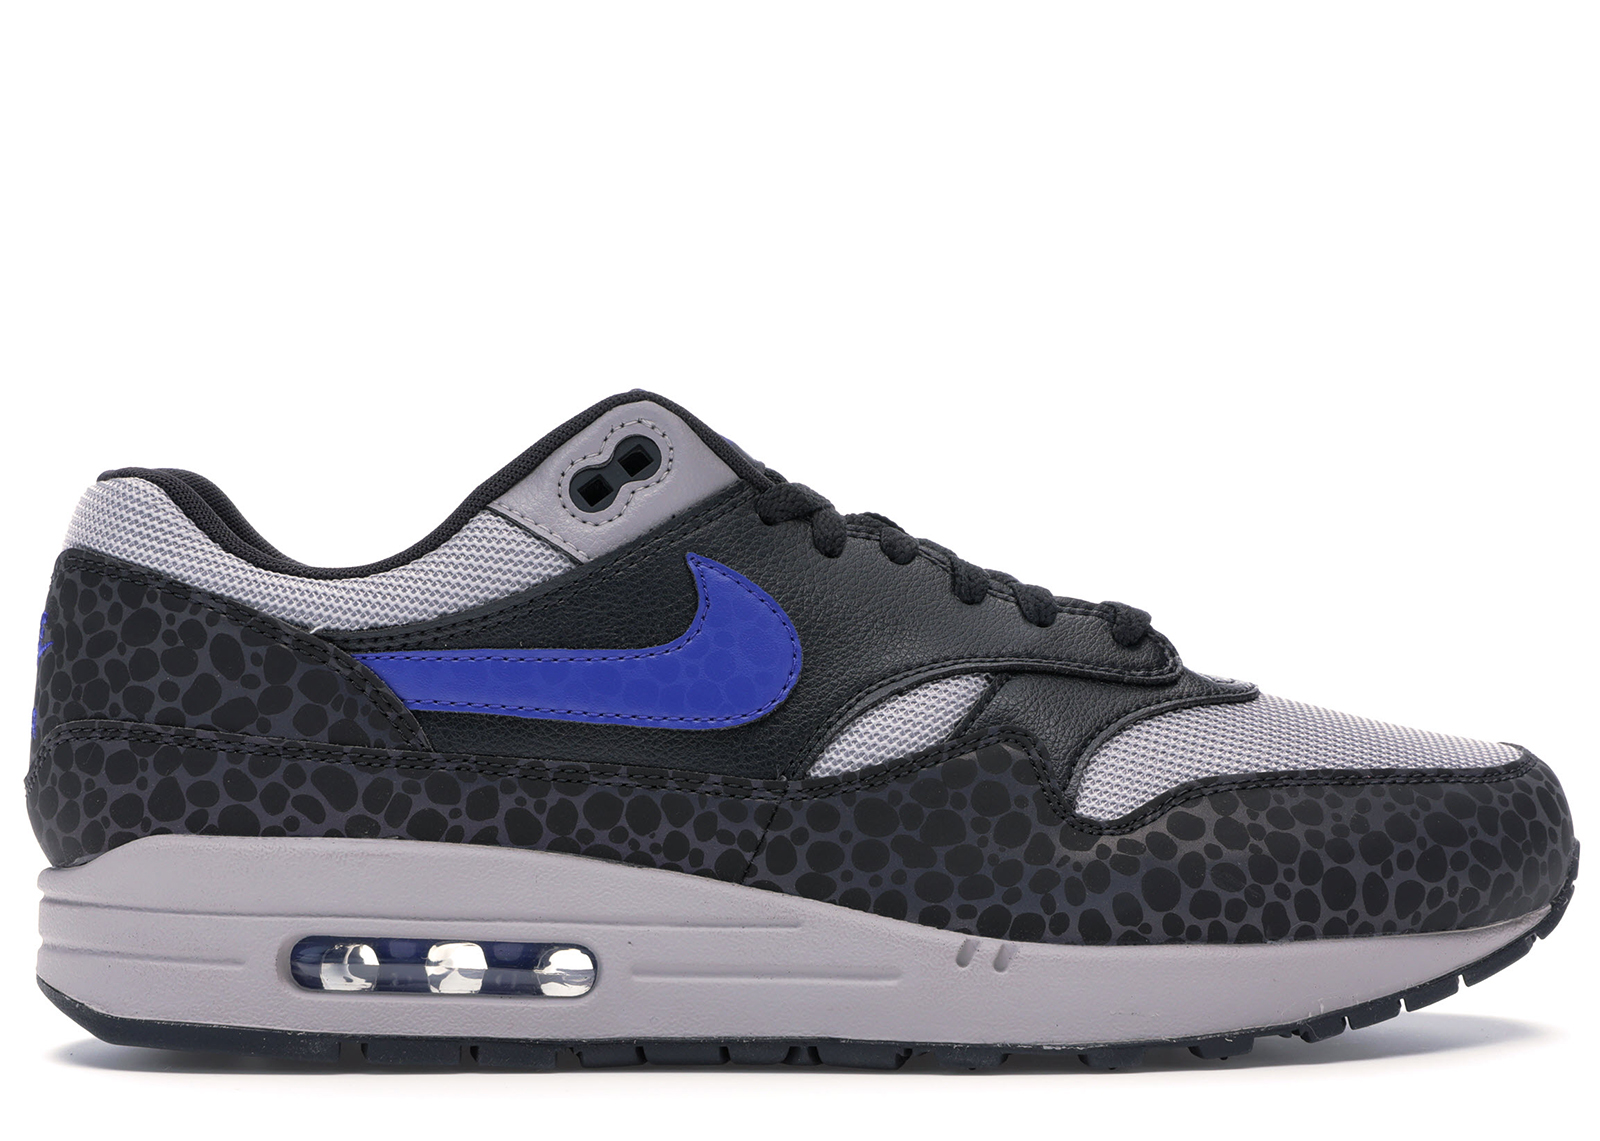 Nike Air Max 1 Safari Reflective Black - BQ6521-001